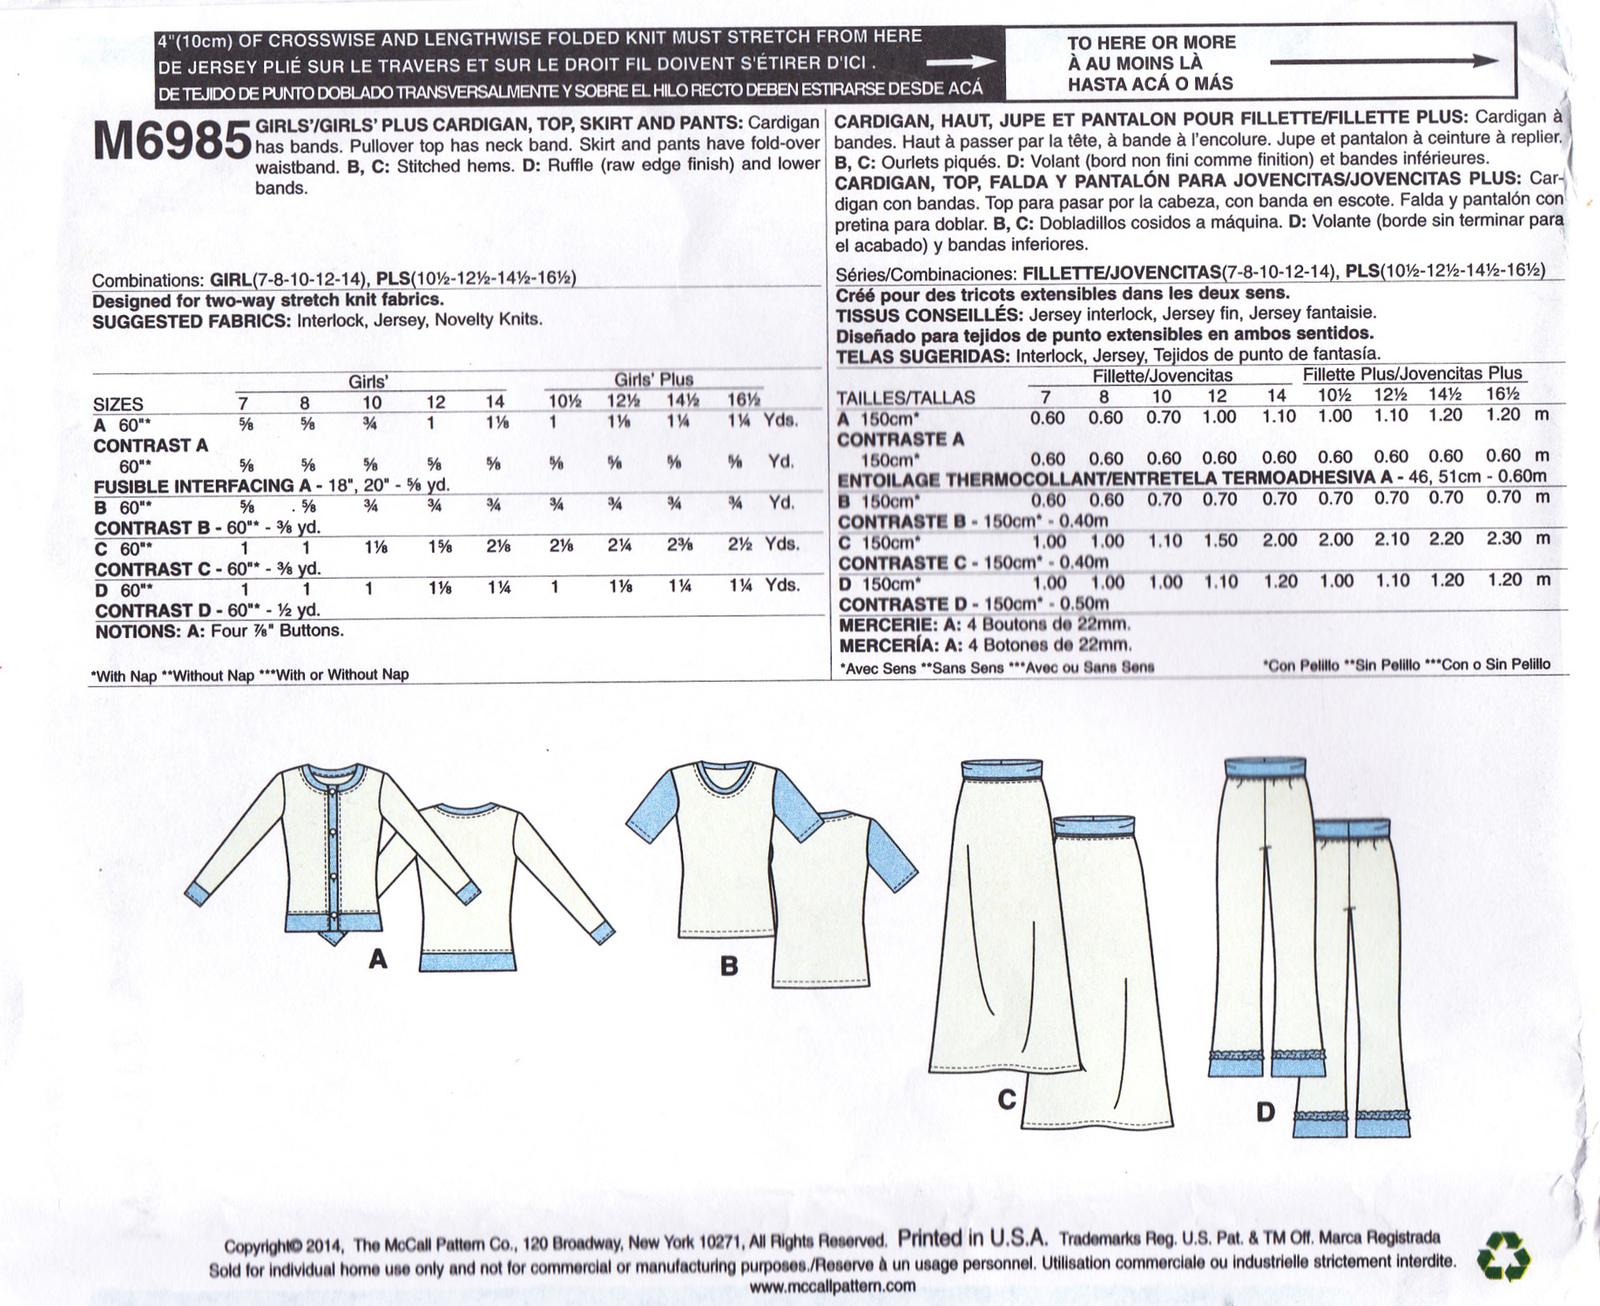 McCall's M6985 Girls Top Skirt Pants Cardigan Sewing Pattern Children Sizes 7-14